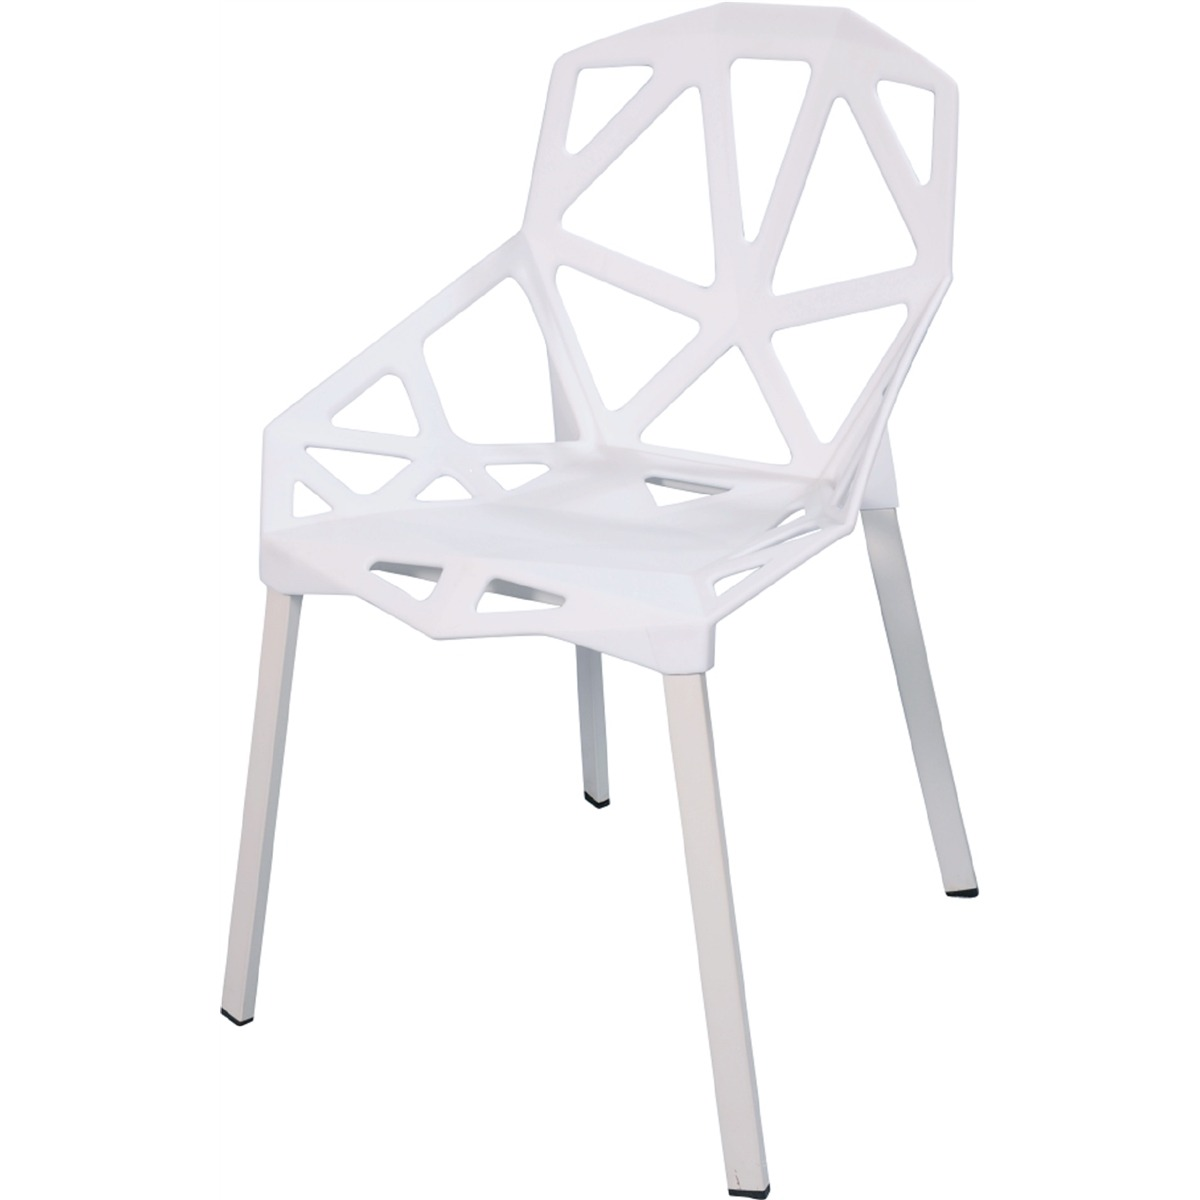 Kit 6 Cadeiras Design Penelope Chair One Pelegrin PEL-1335 Cor Branca